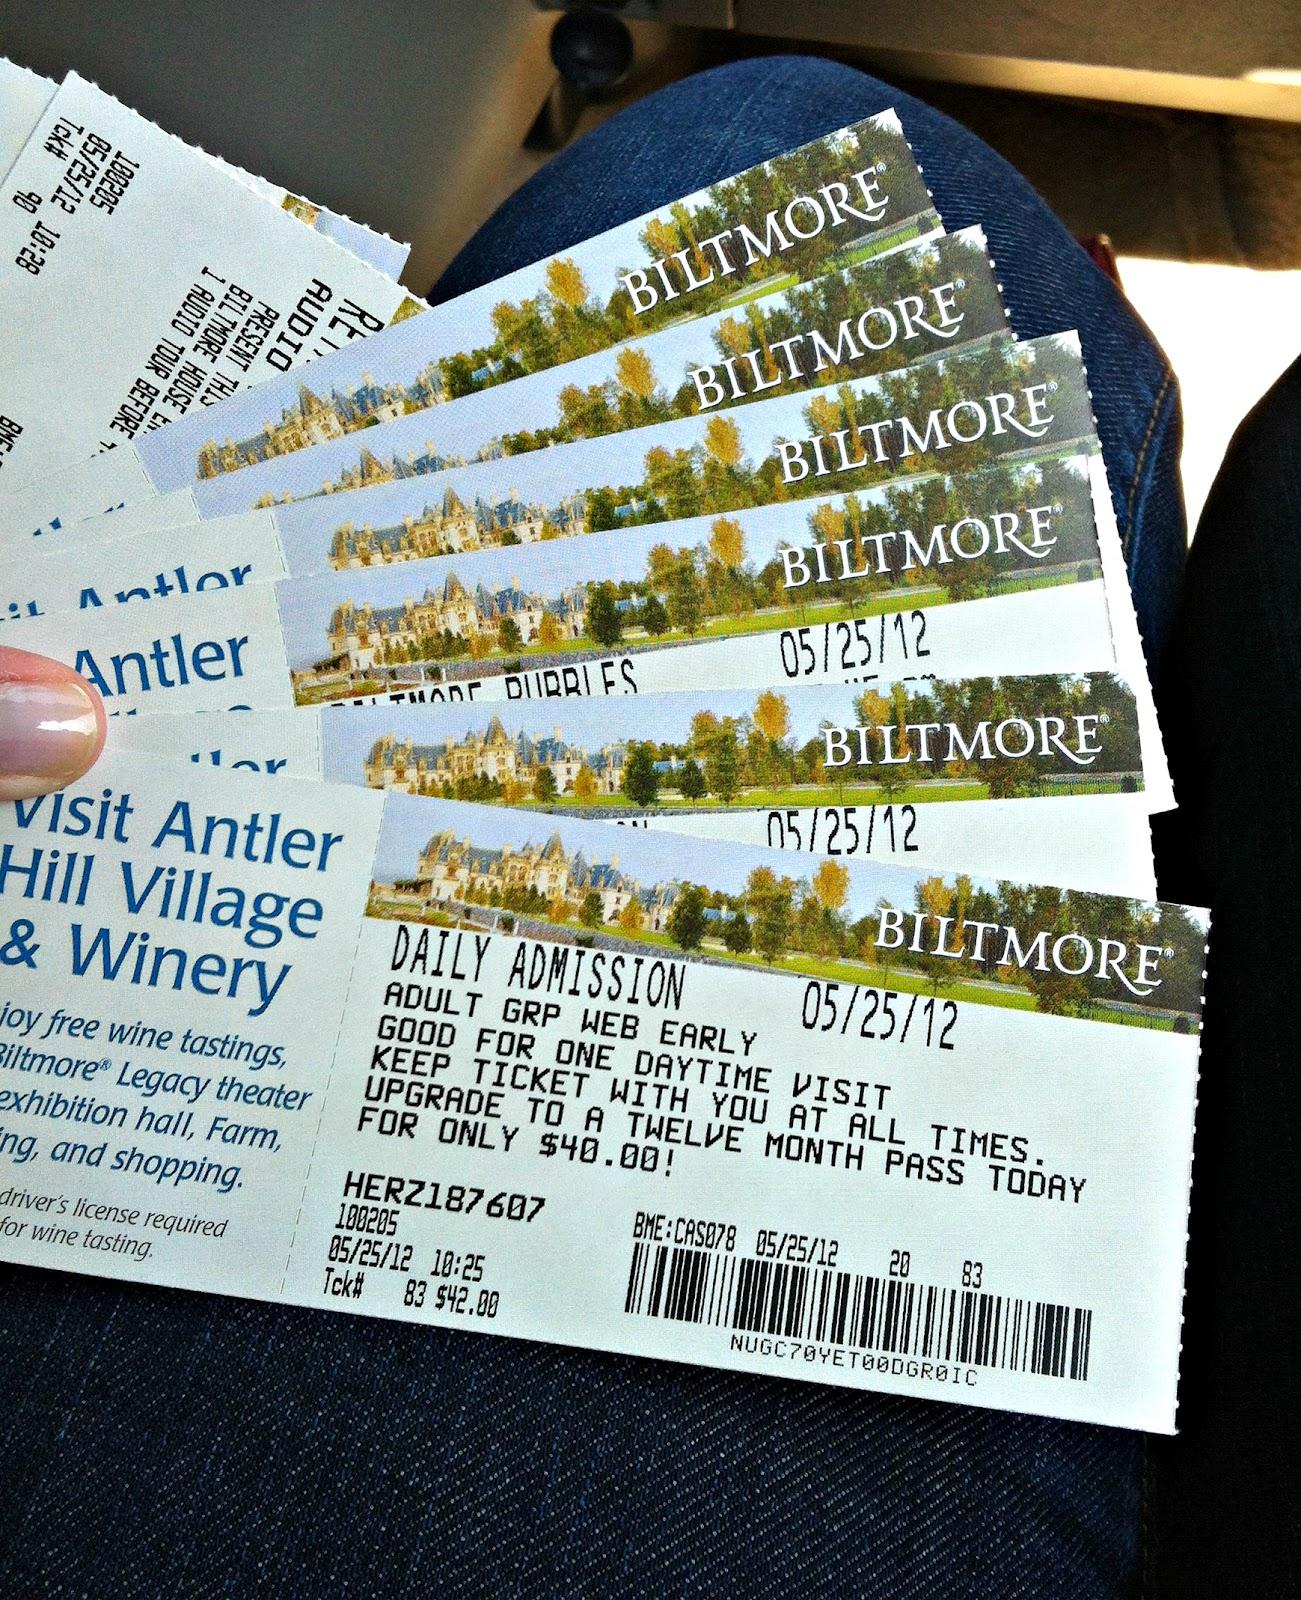 Biltmore Tour Discount Tickets